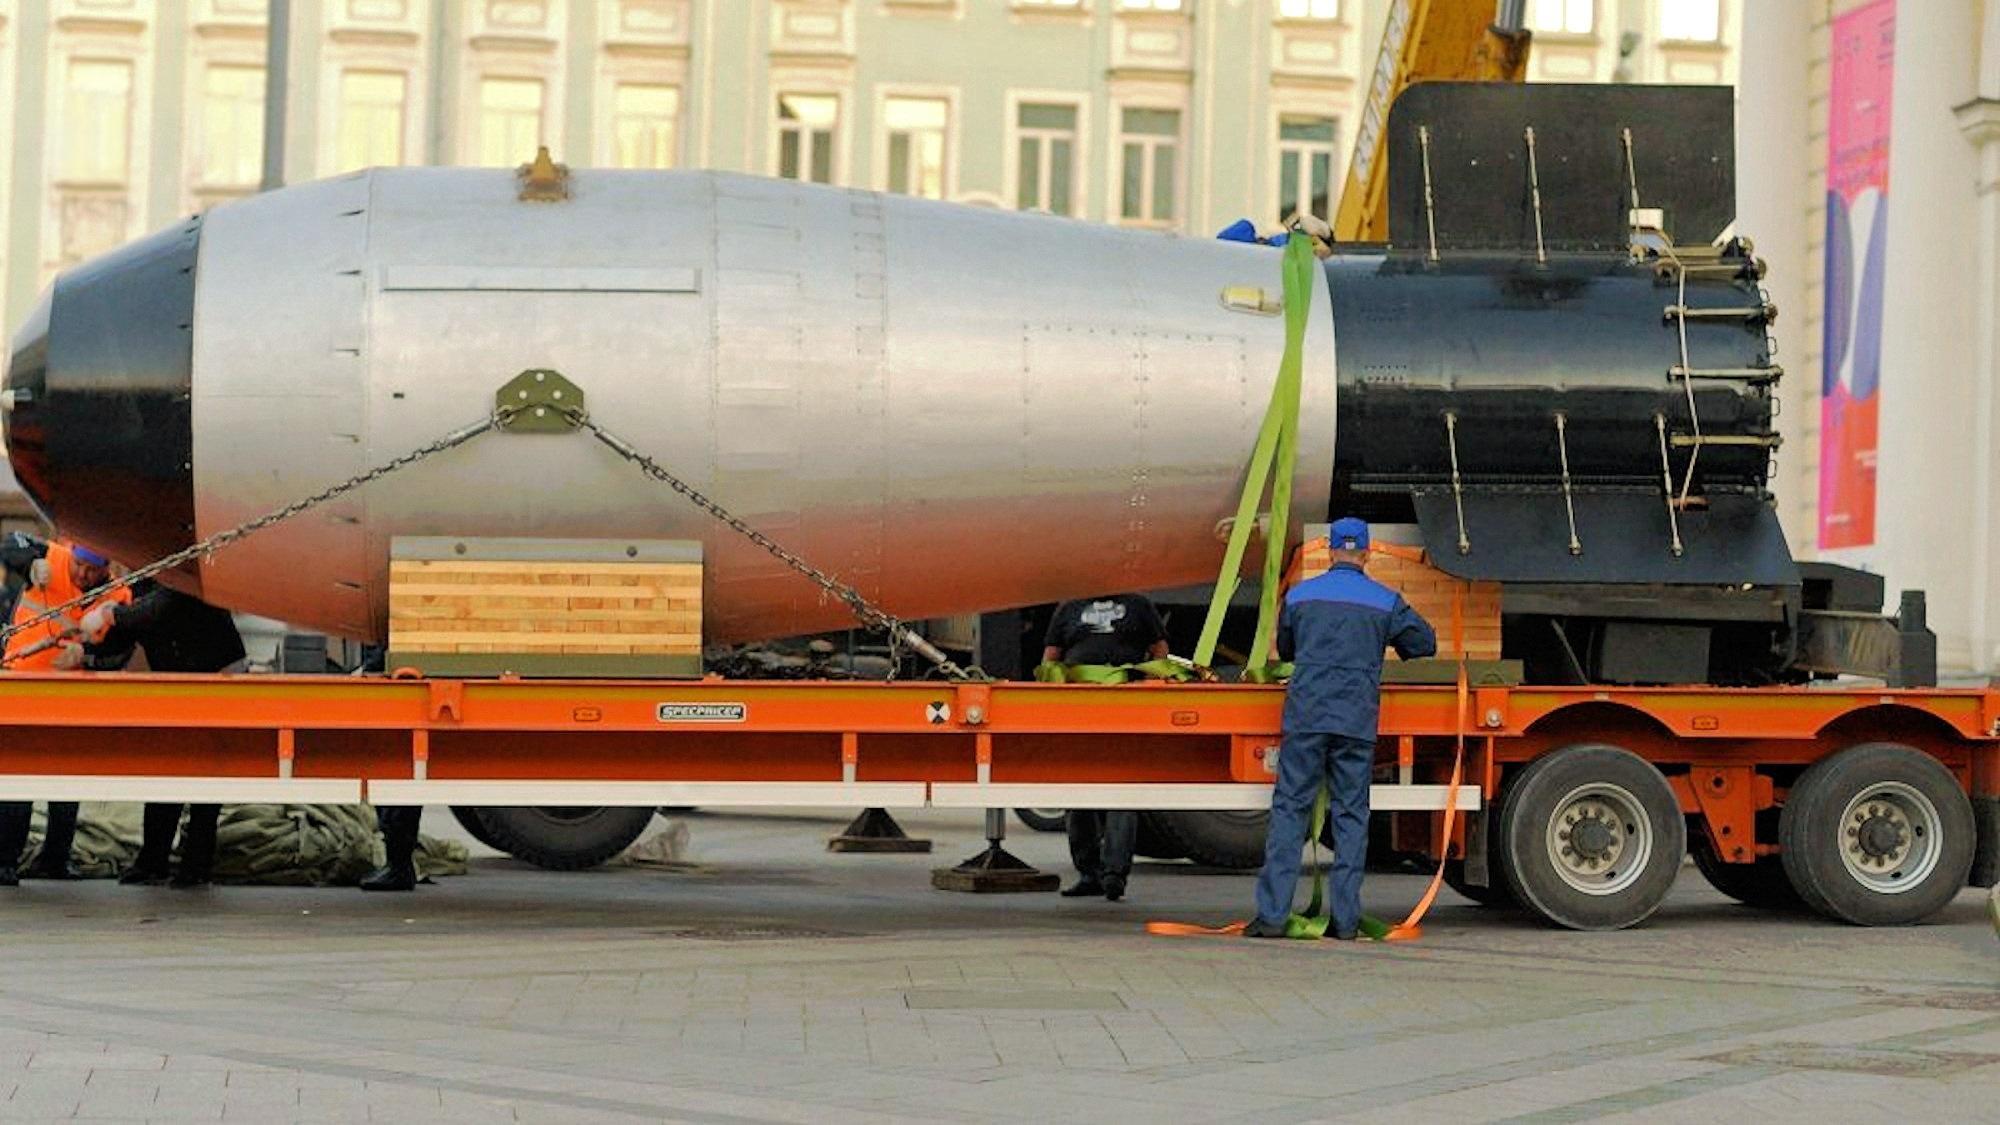 00-russia-ussr-tsar-bomba-301016